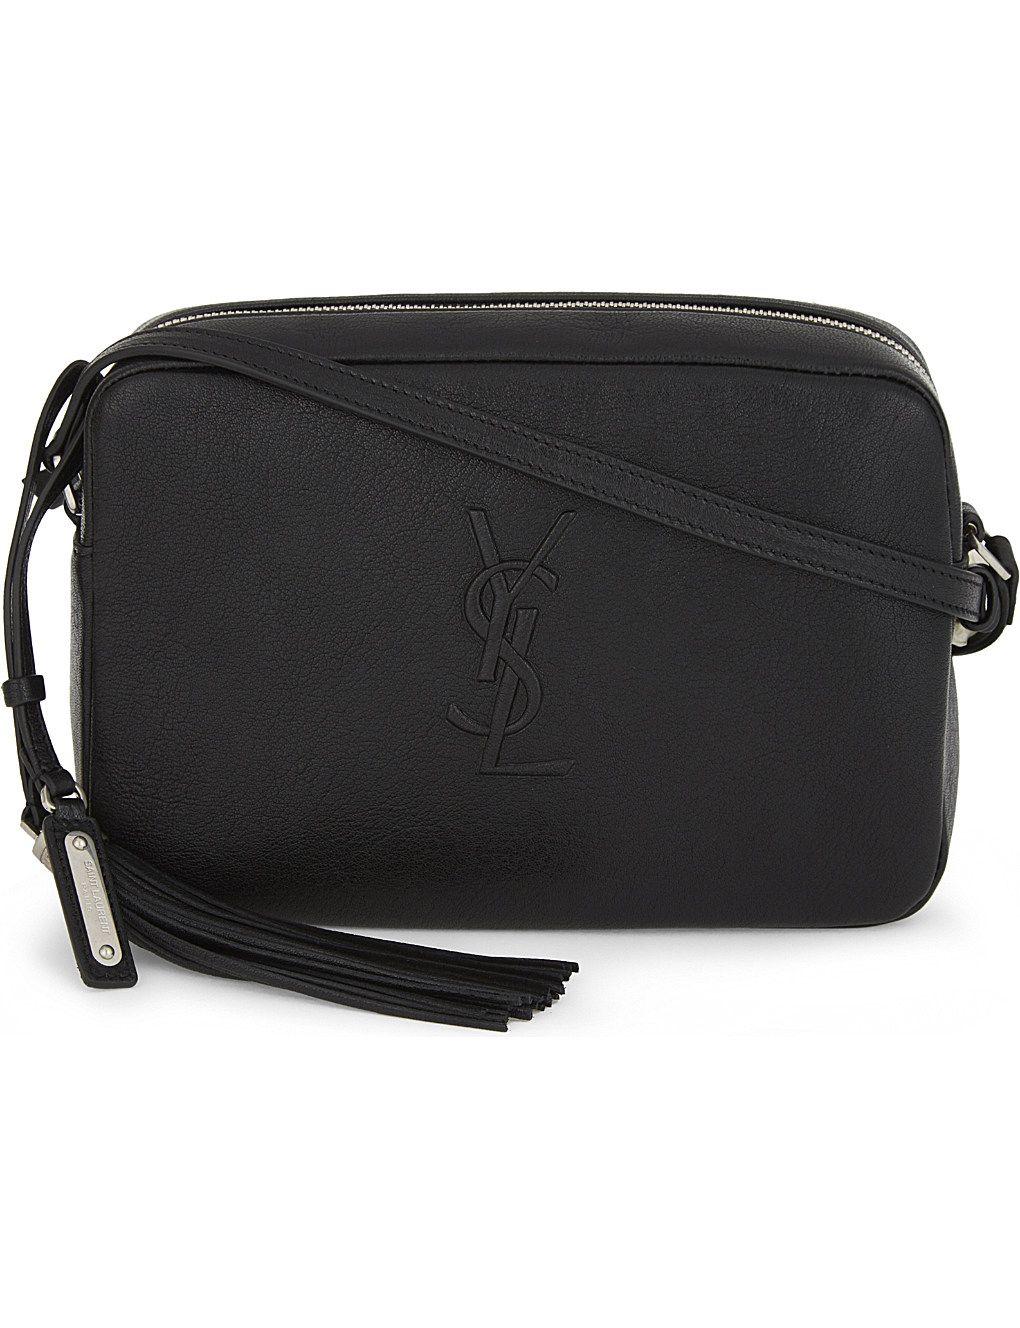 889db79eed31 SAINT LAURENT Monogram LouLou leather cross-body bag